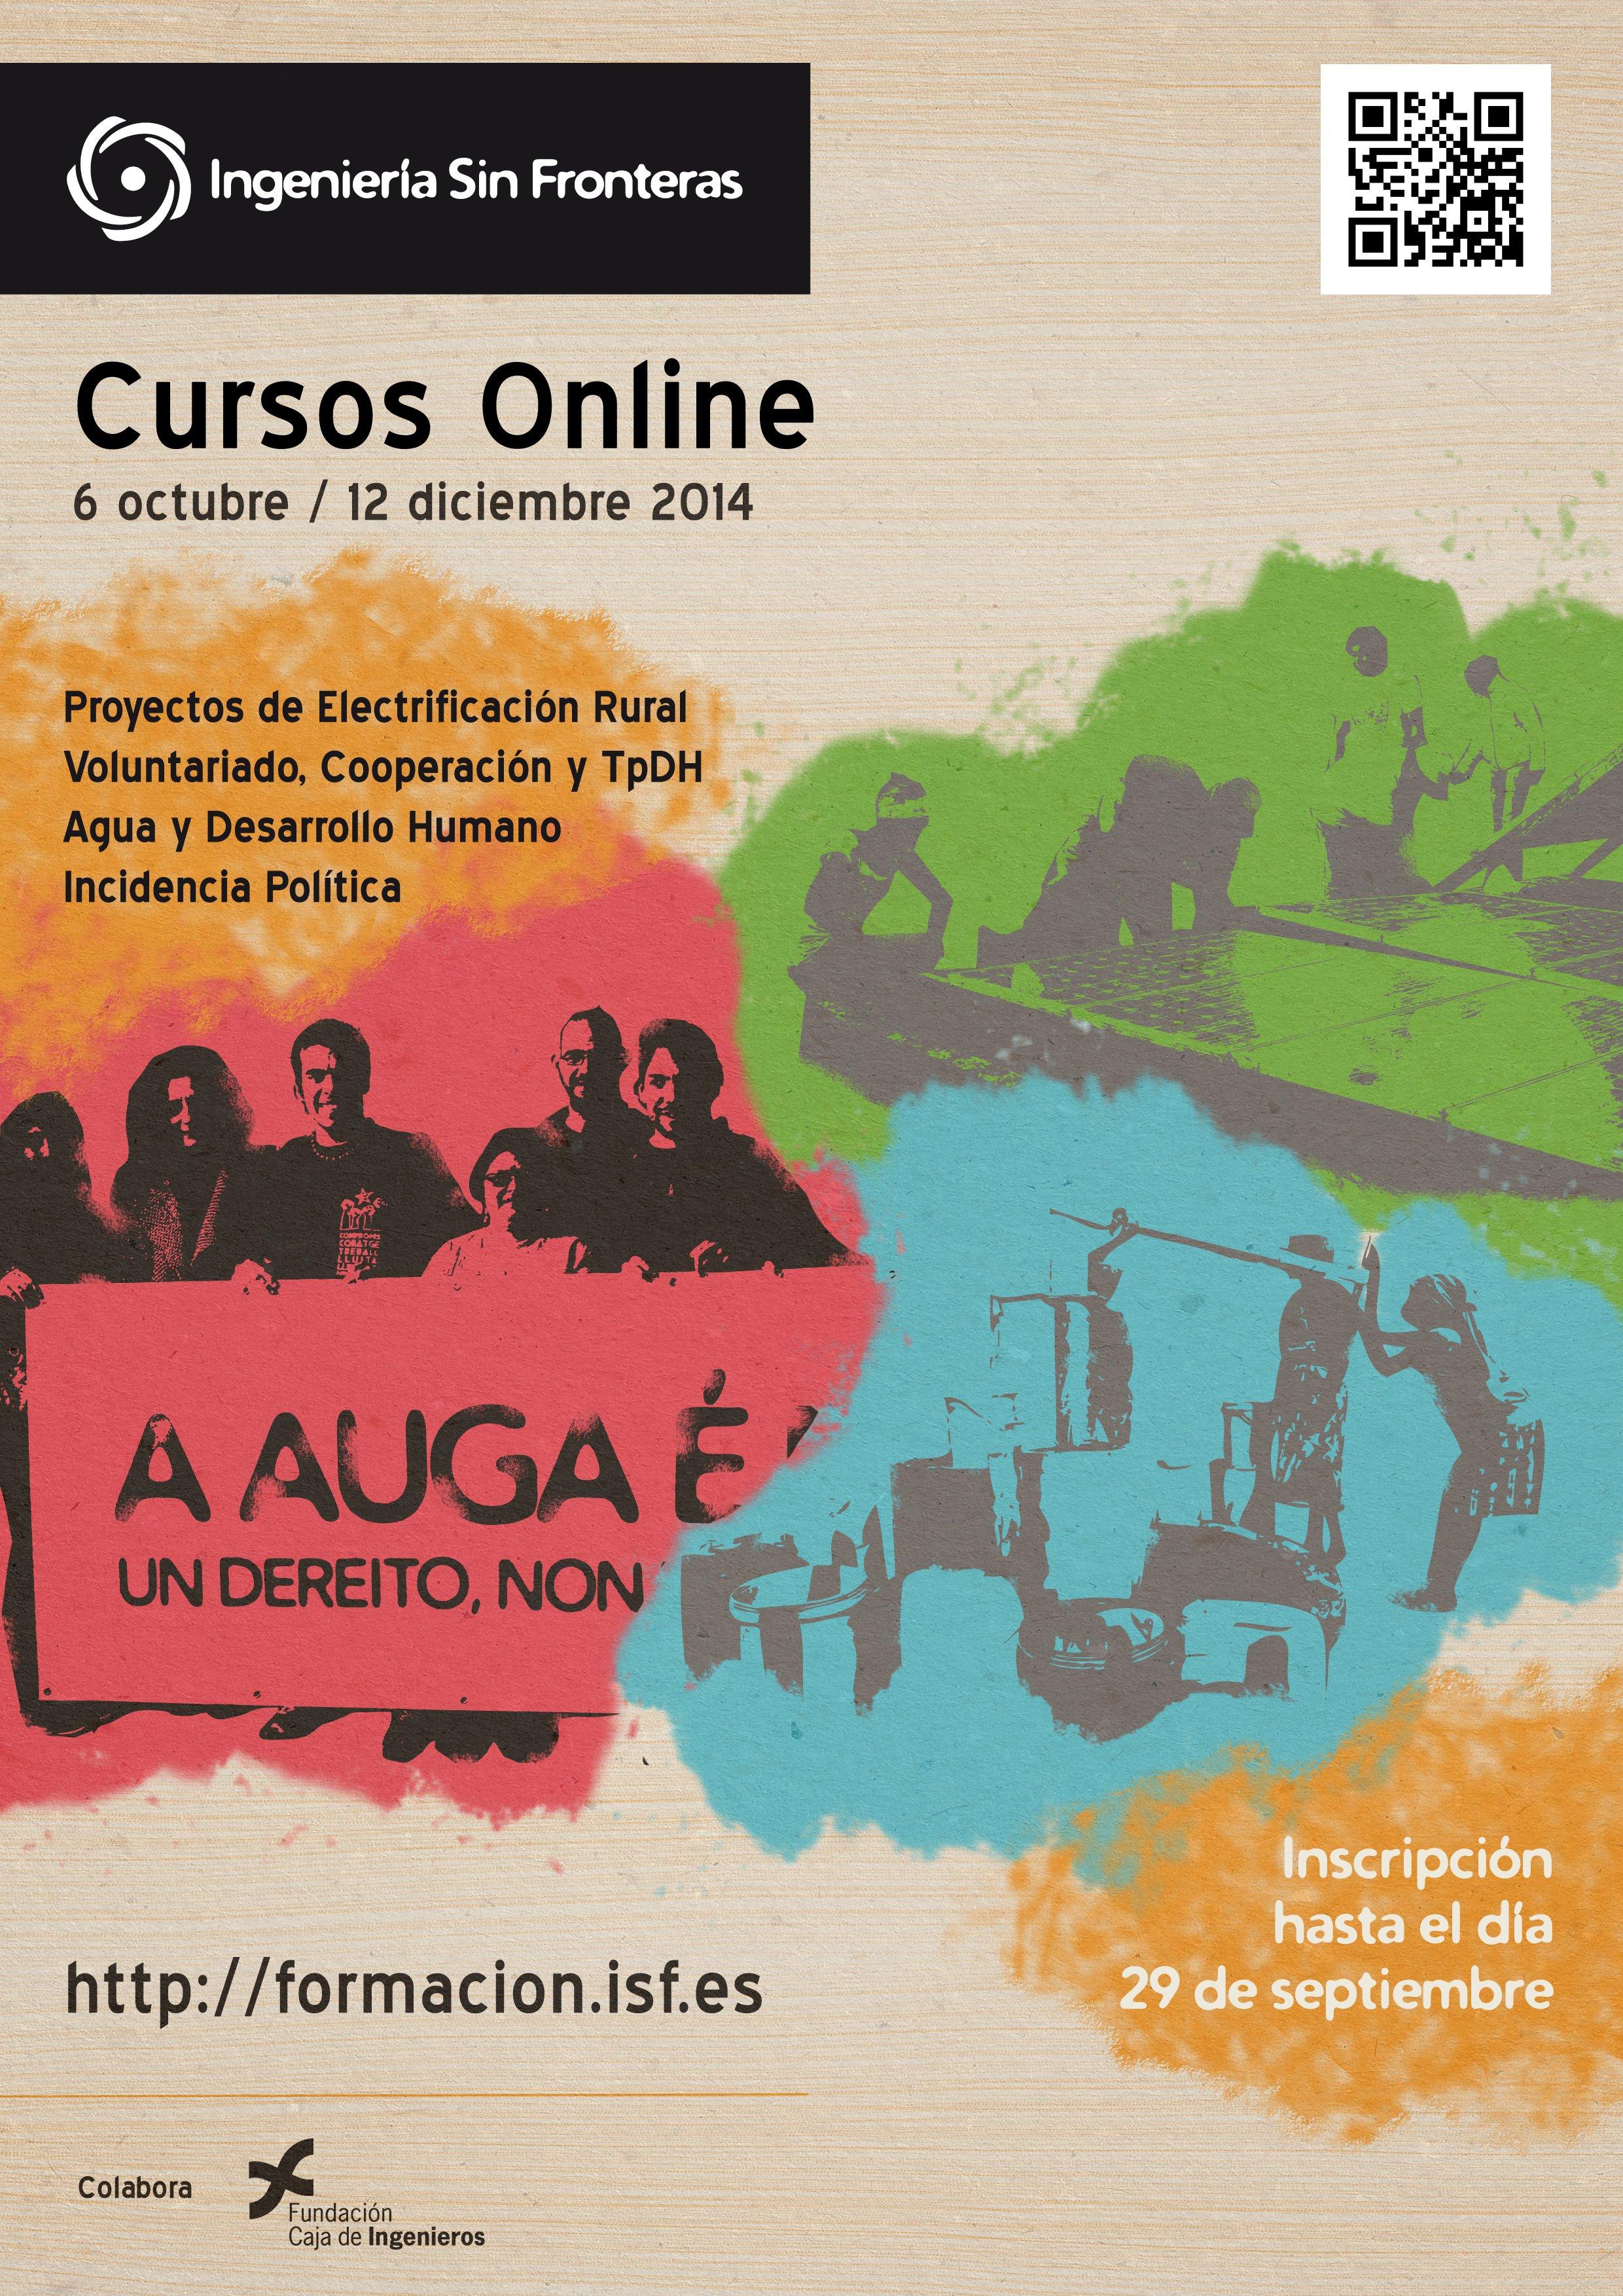 Curso para concurso online